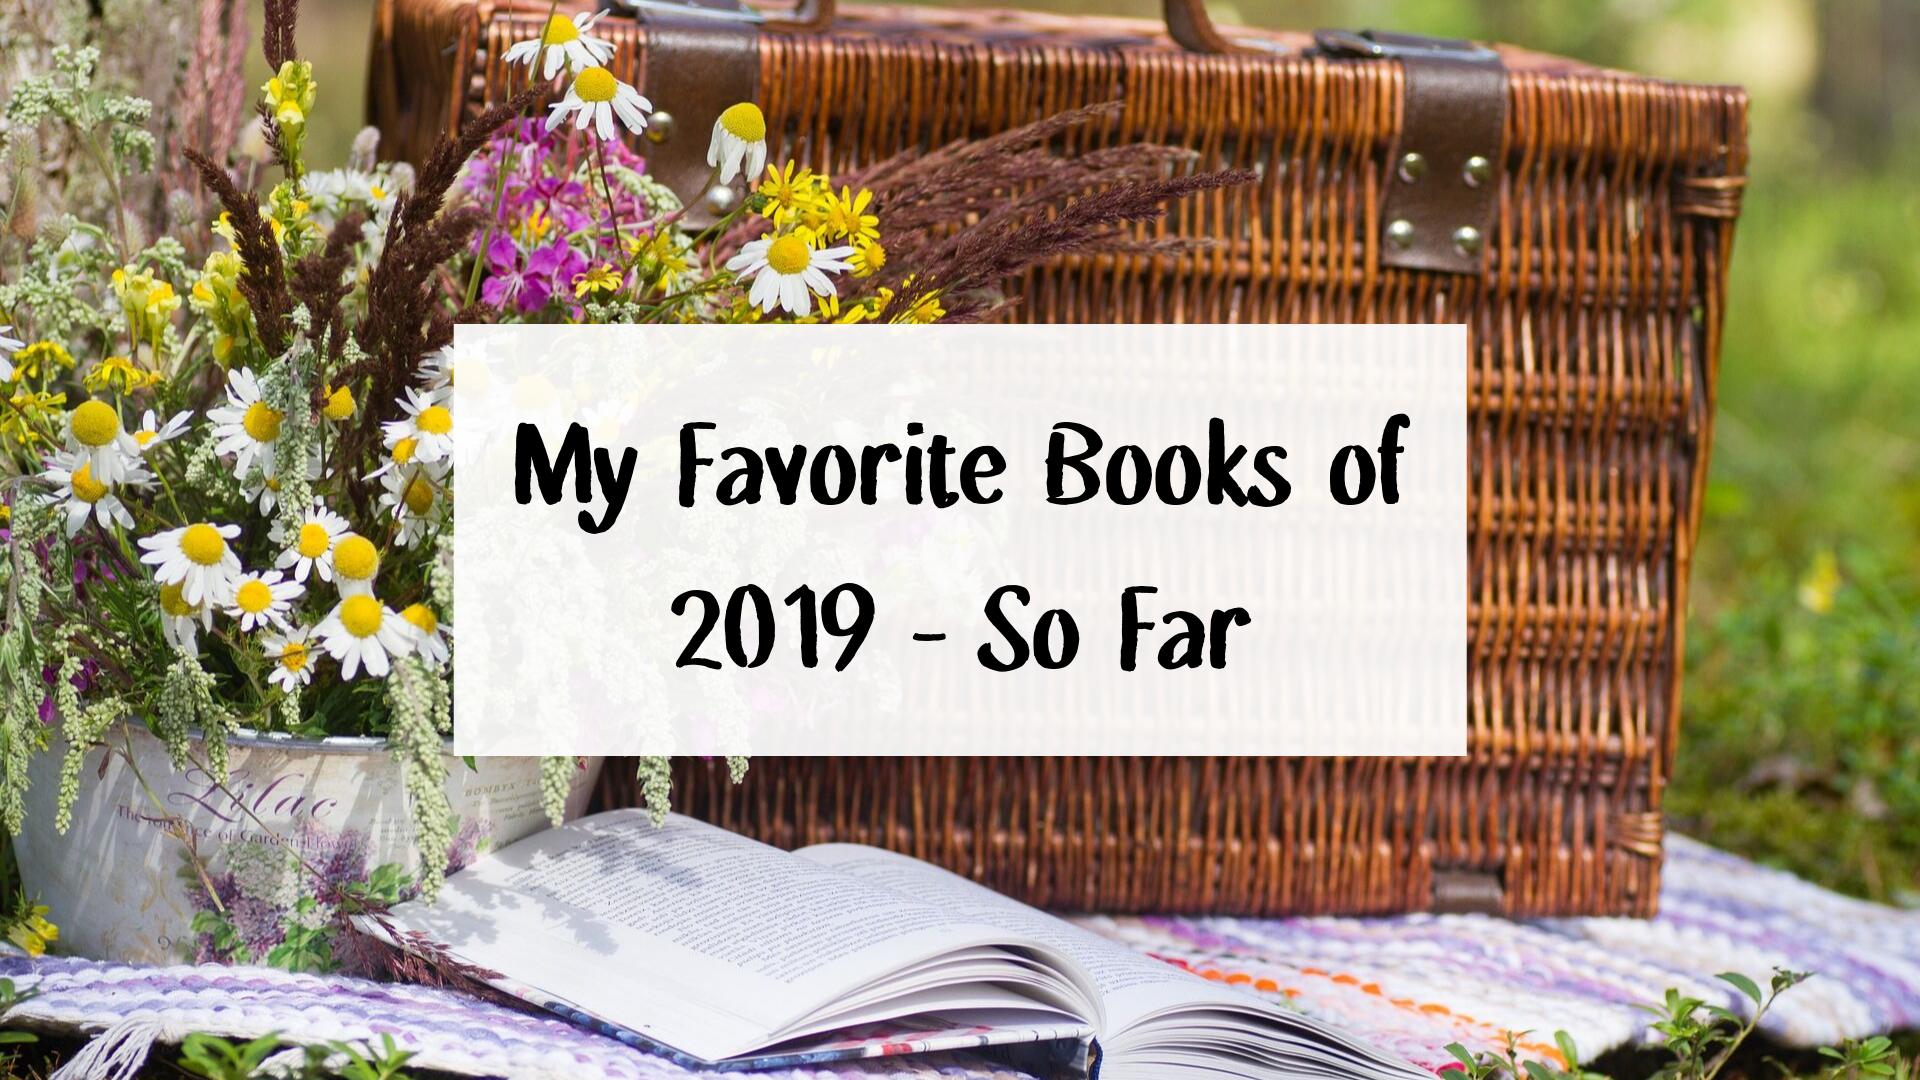 My Favorite Books of 2019 - So Far